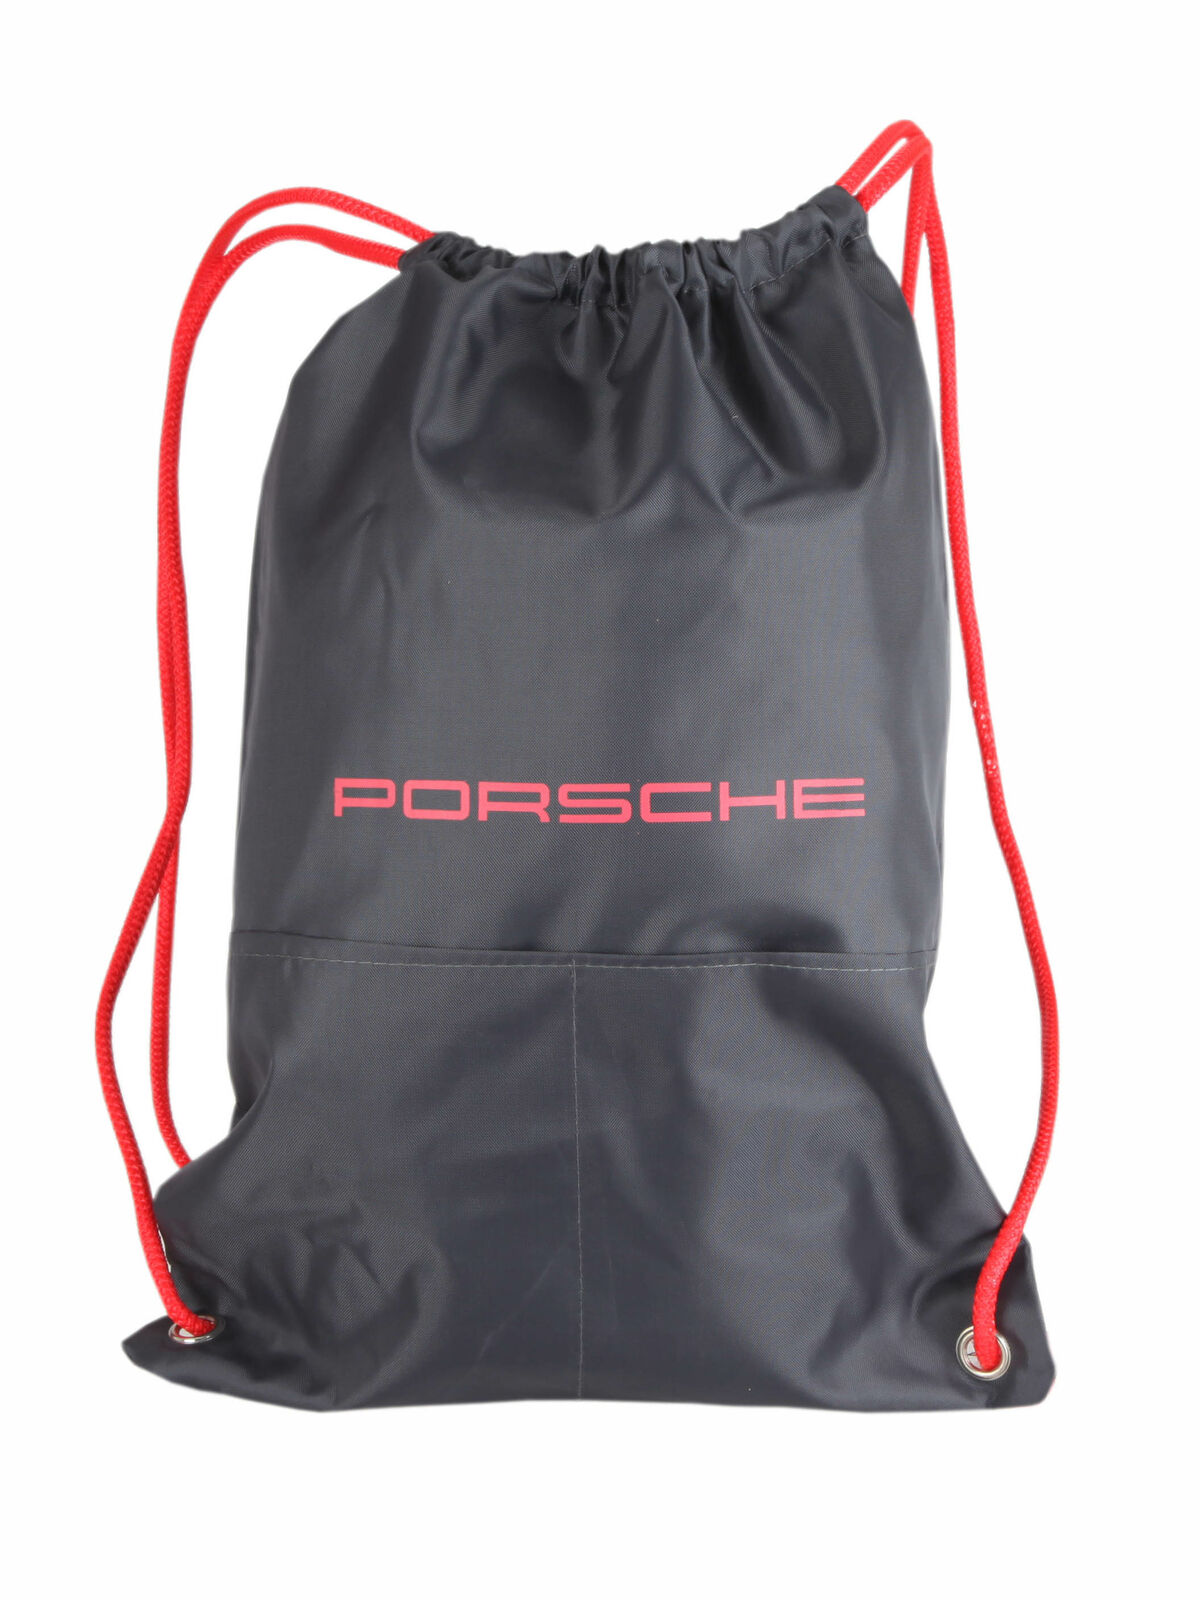 Porsche Driver's Selection Bag Pouch Bag Toiletry Bag Shoe B